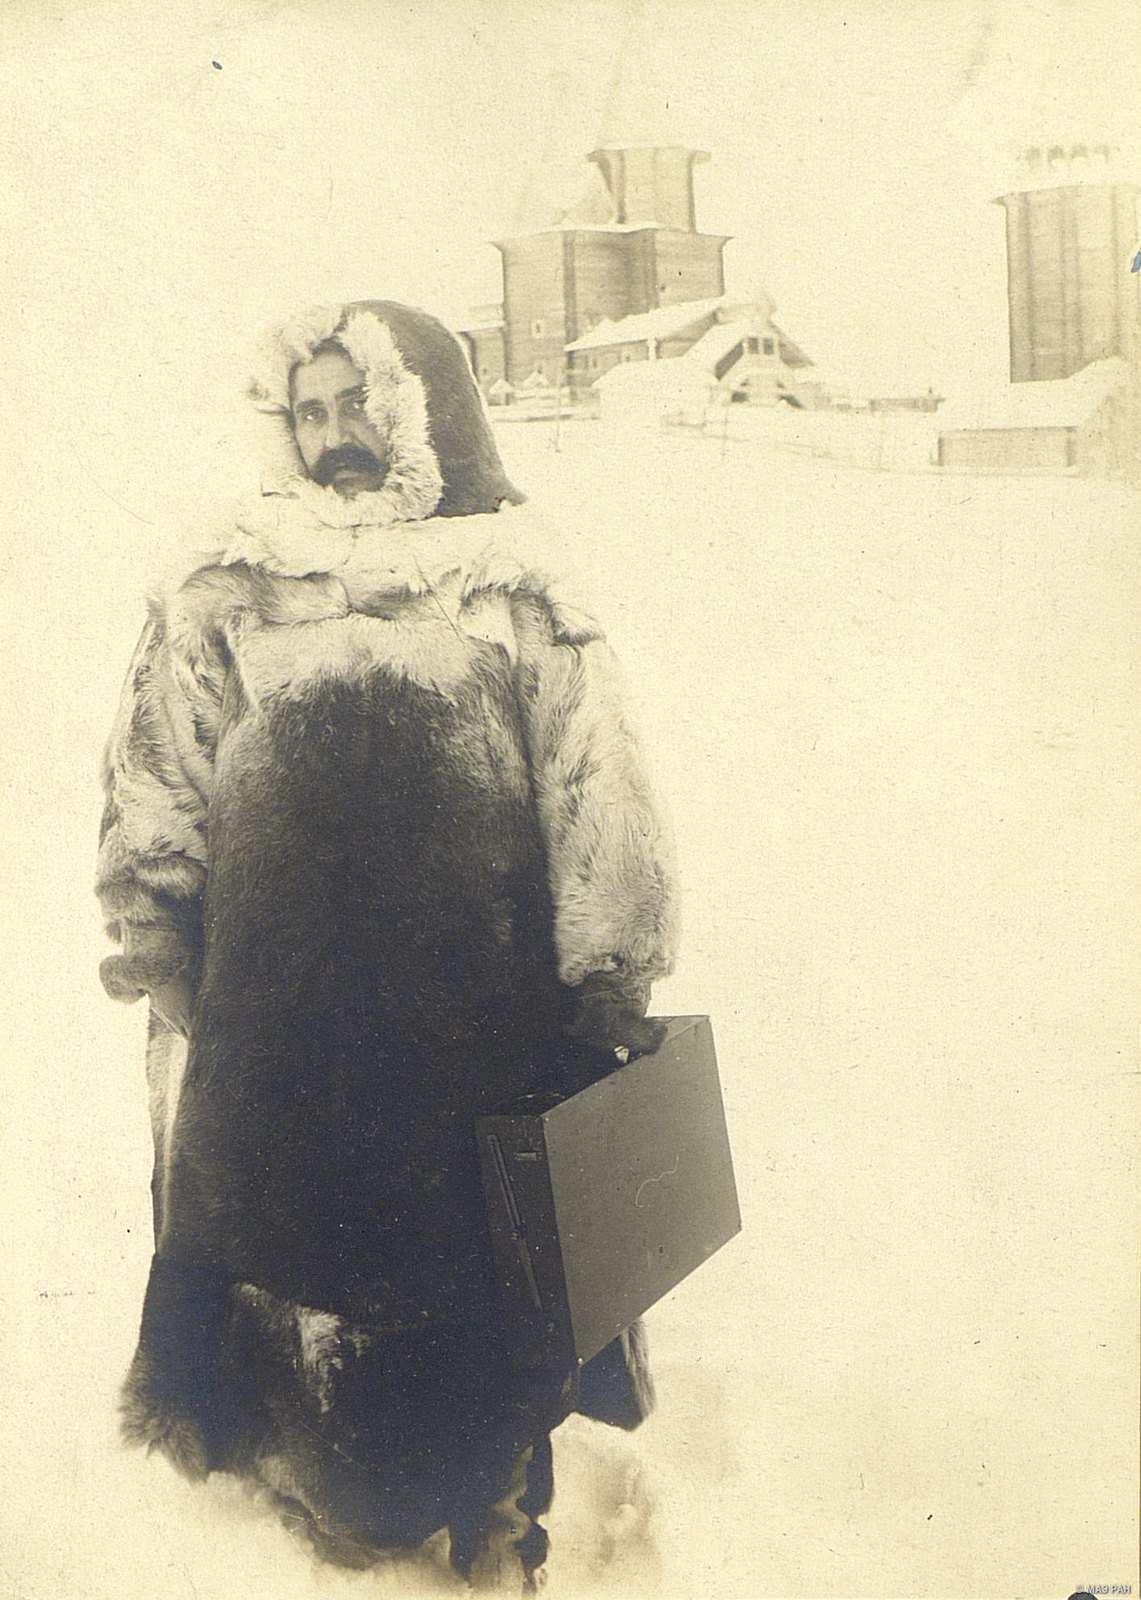 Николай Авенирович Шабунин в самоедском костюме.